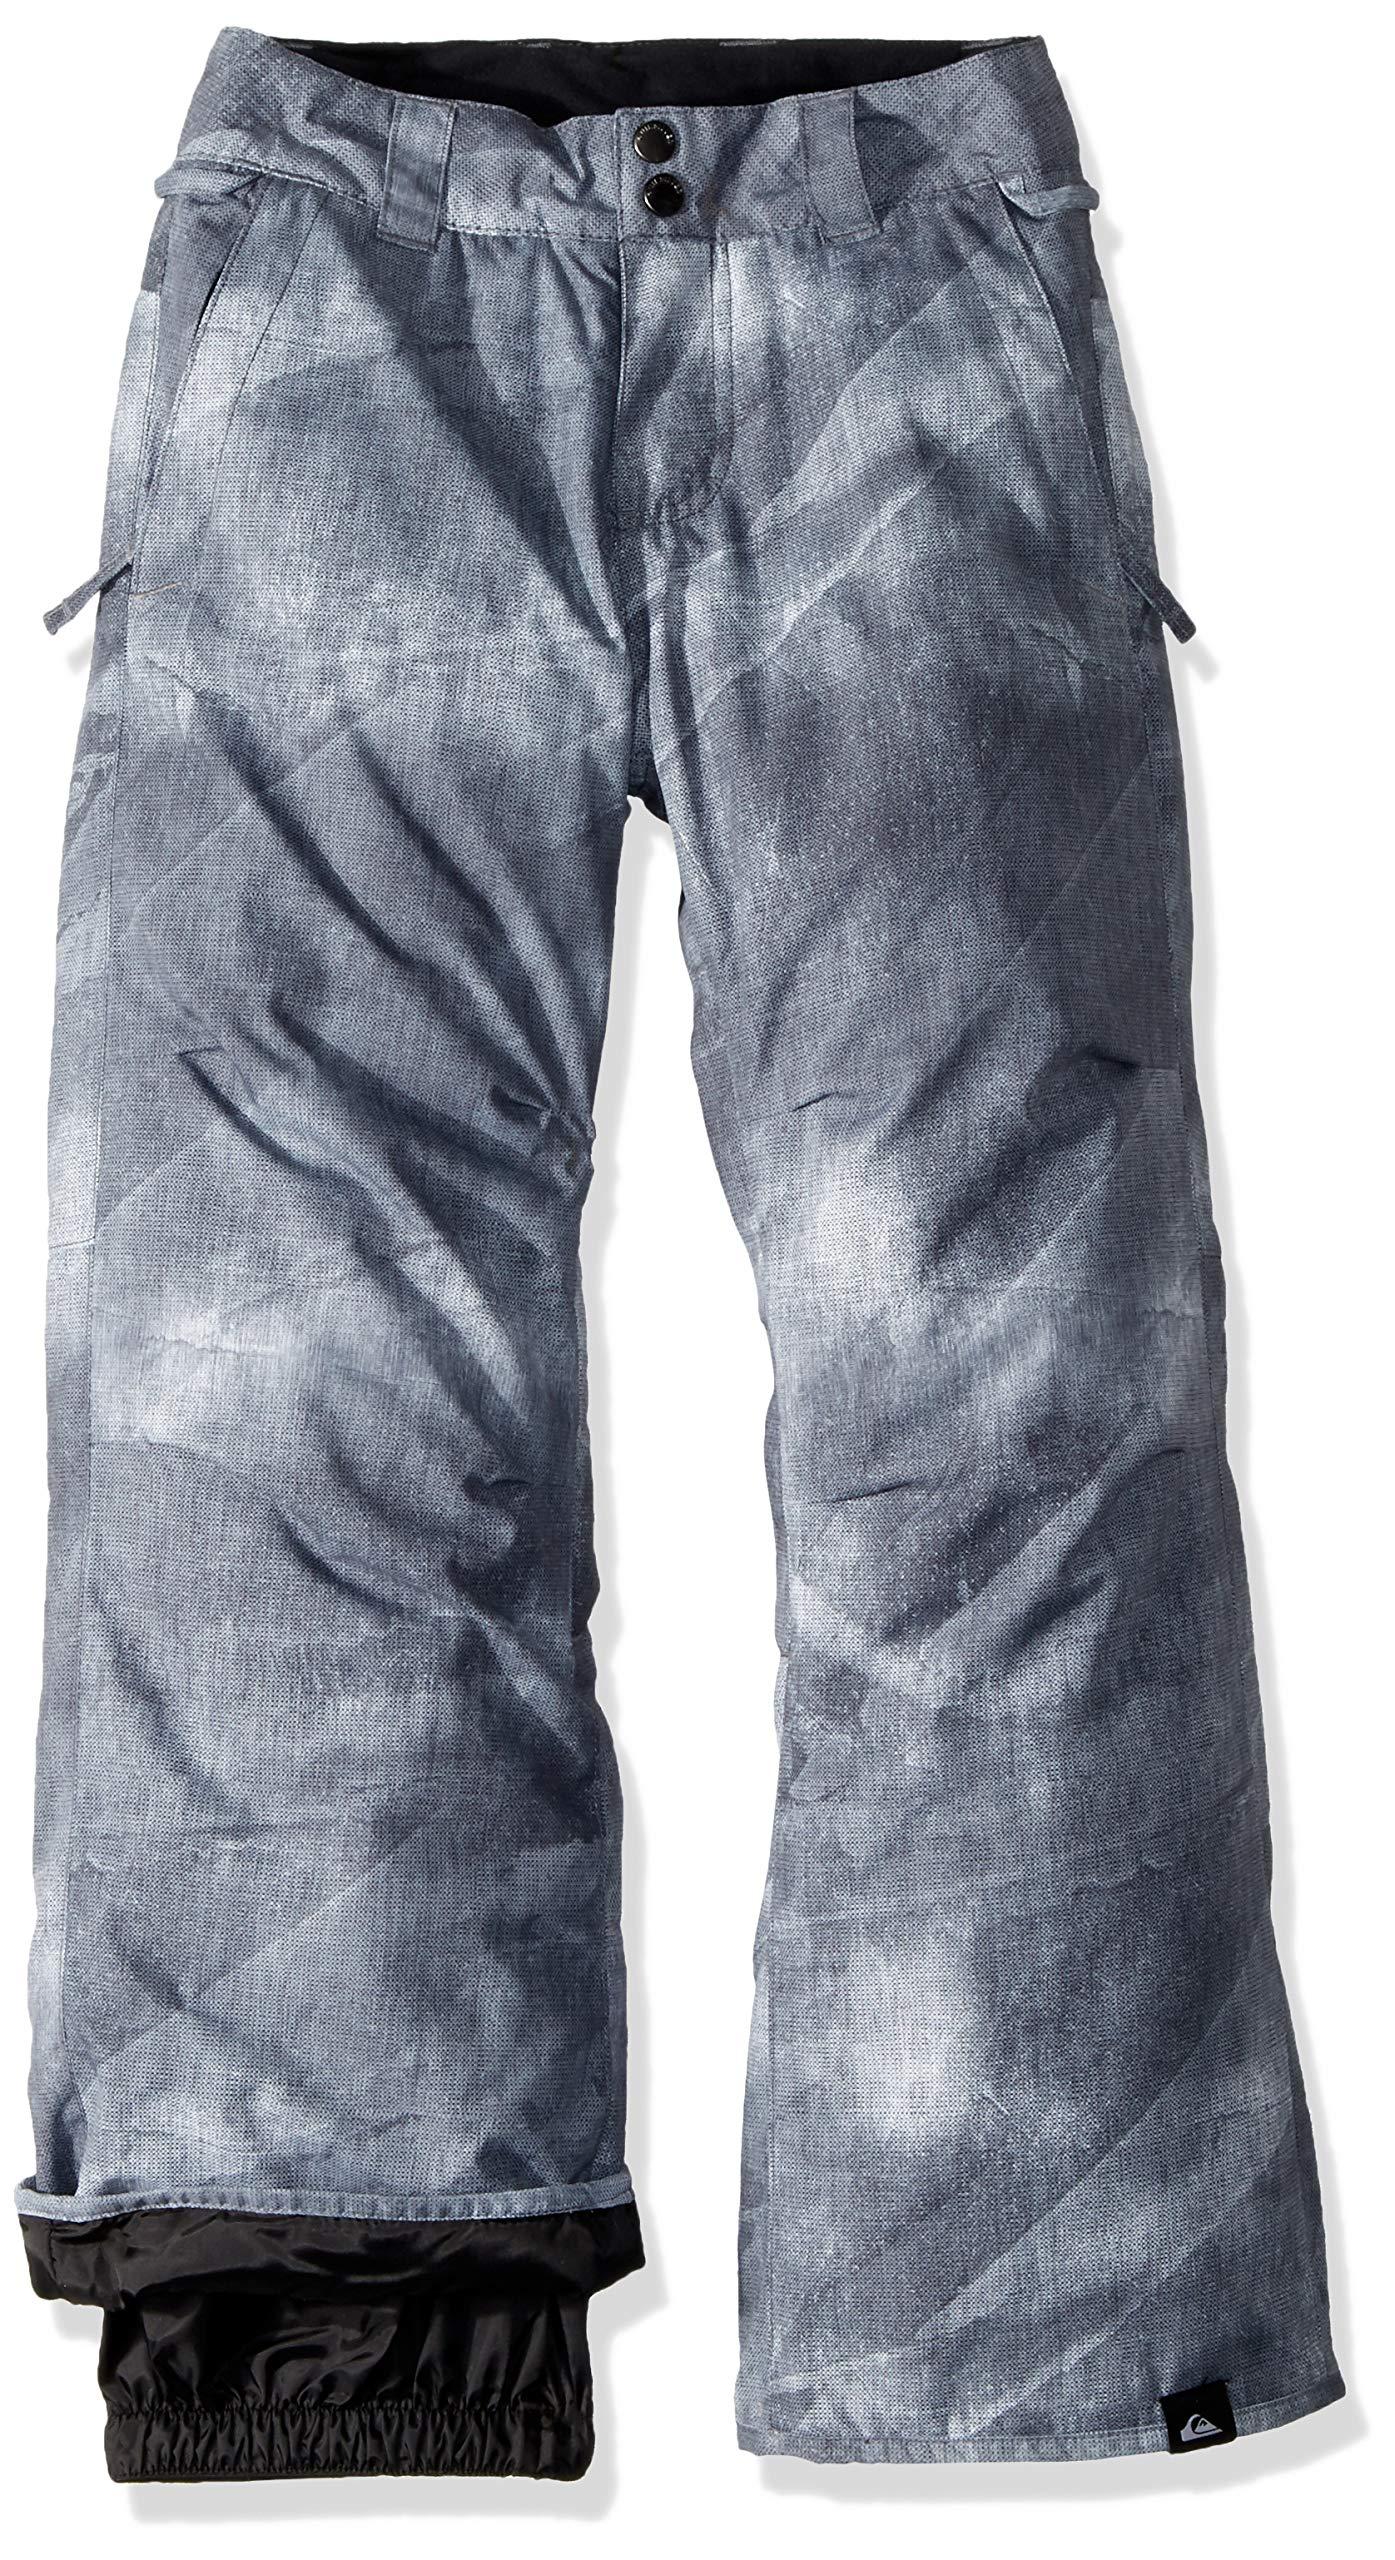 Quiksilver Boys' Big Estate Youth 10K Snow Pants, Grey Simple Texture, 12/L